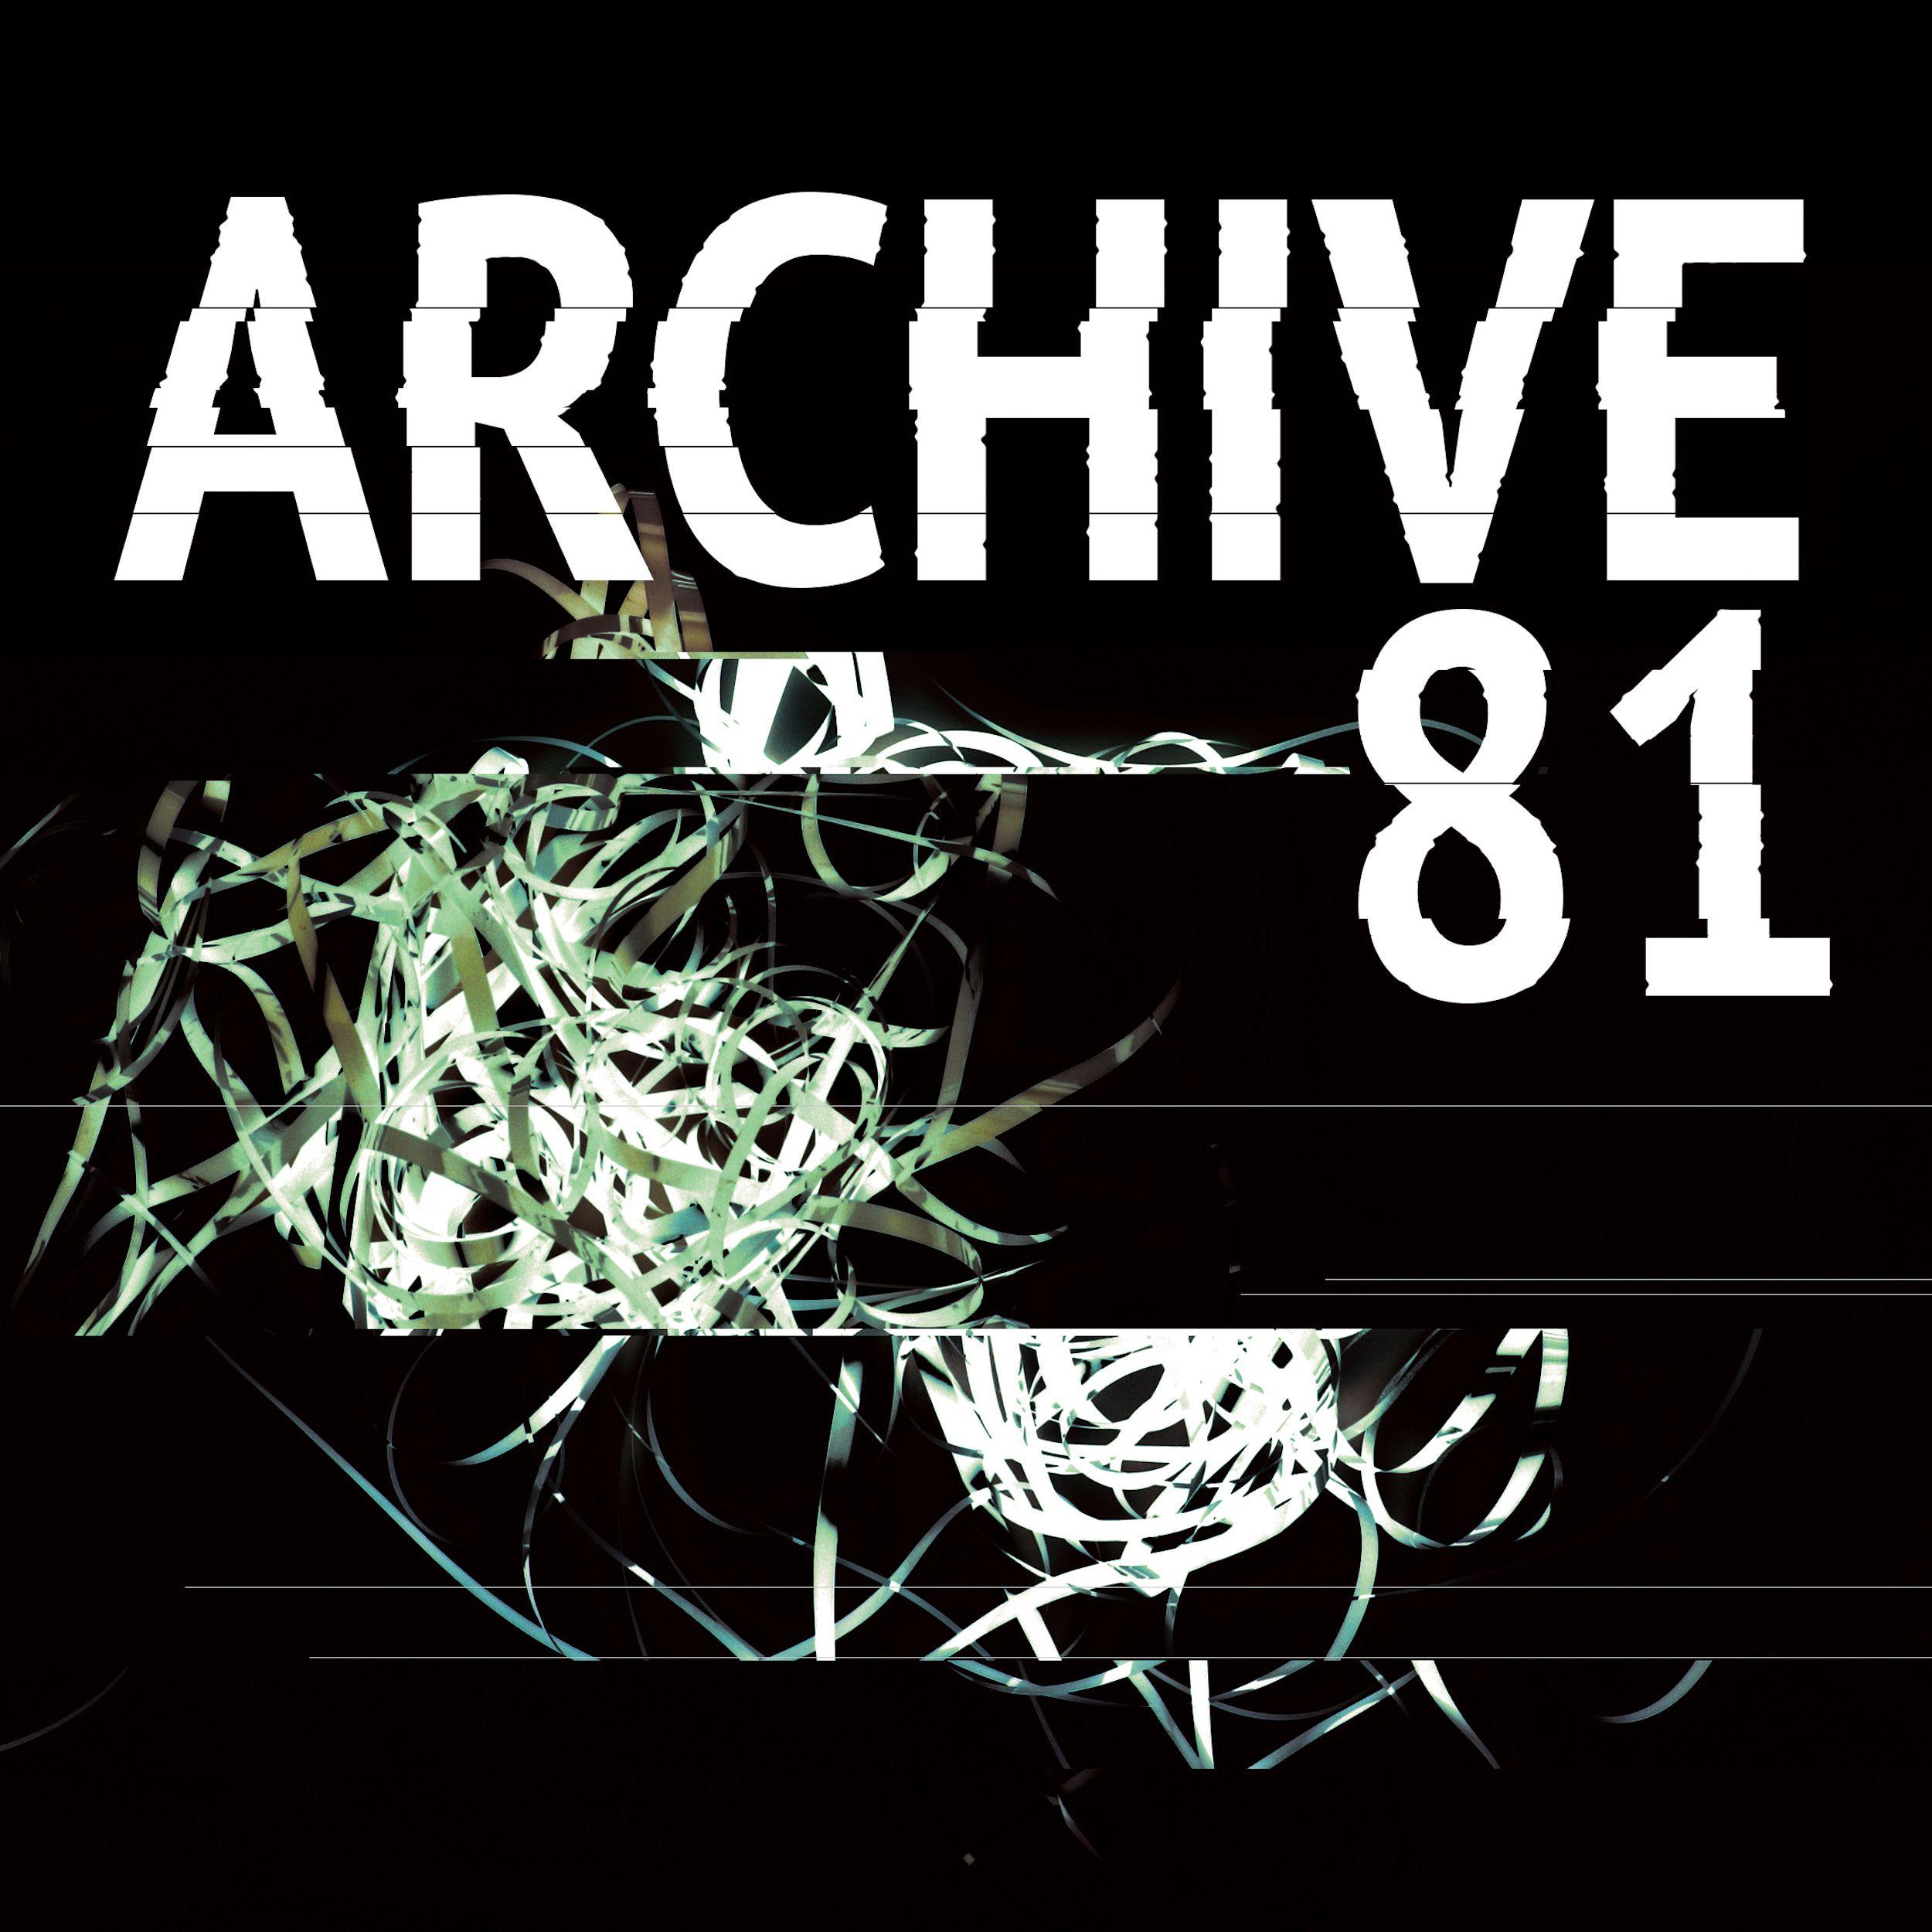 Archive 81 logo